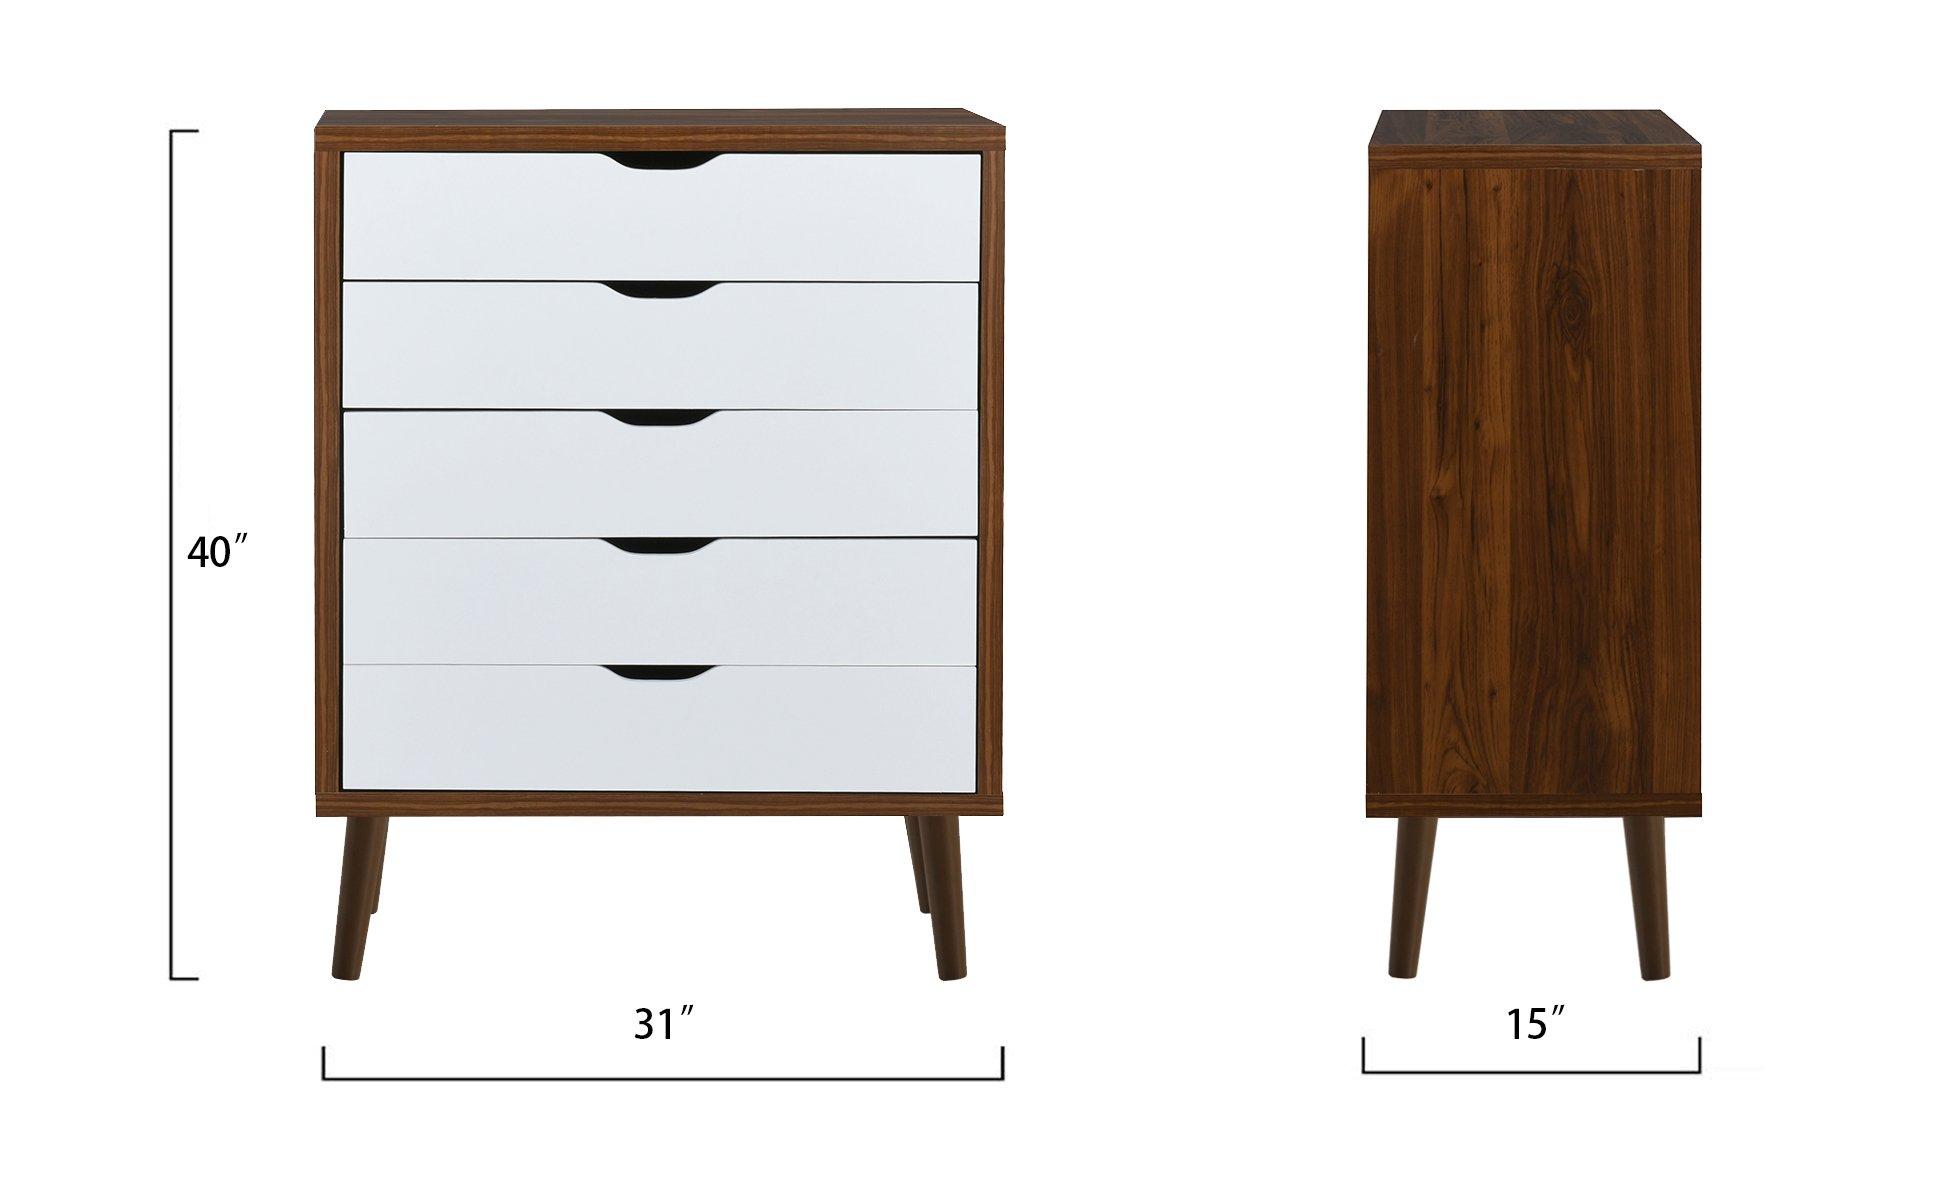 mid century modern home decor entryway dresser chest of drawers brown white 649862752704 ebay. Black Bedroom Furniture Sets. Home Design Ideas